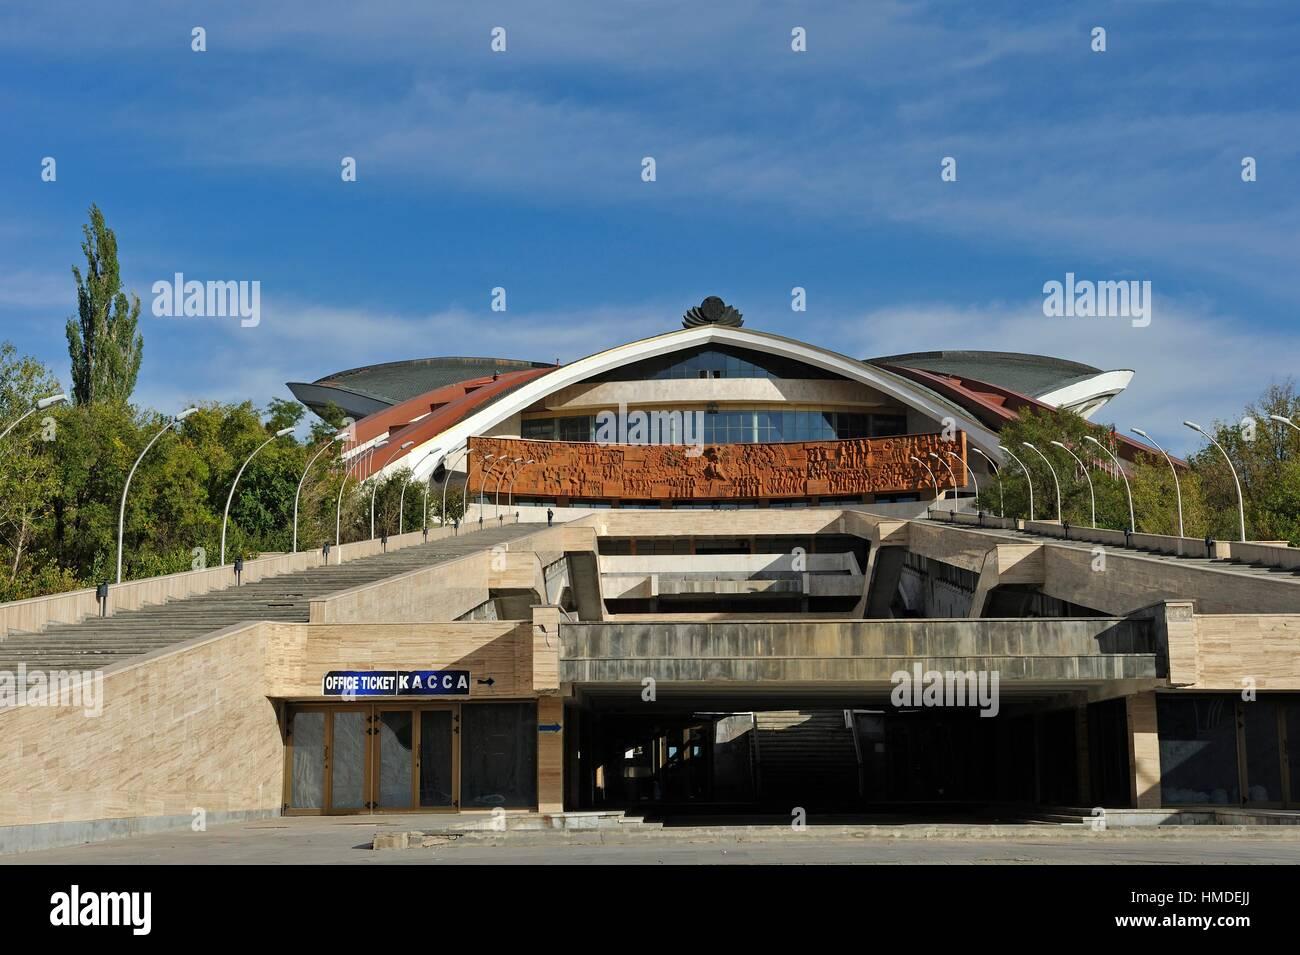 Karen Demirchyan Sports and Concerts Complex, Yerevan, Armenia, Eurasia. - Stock Image